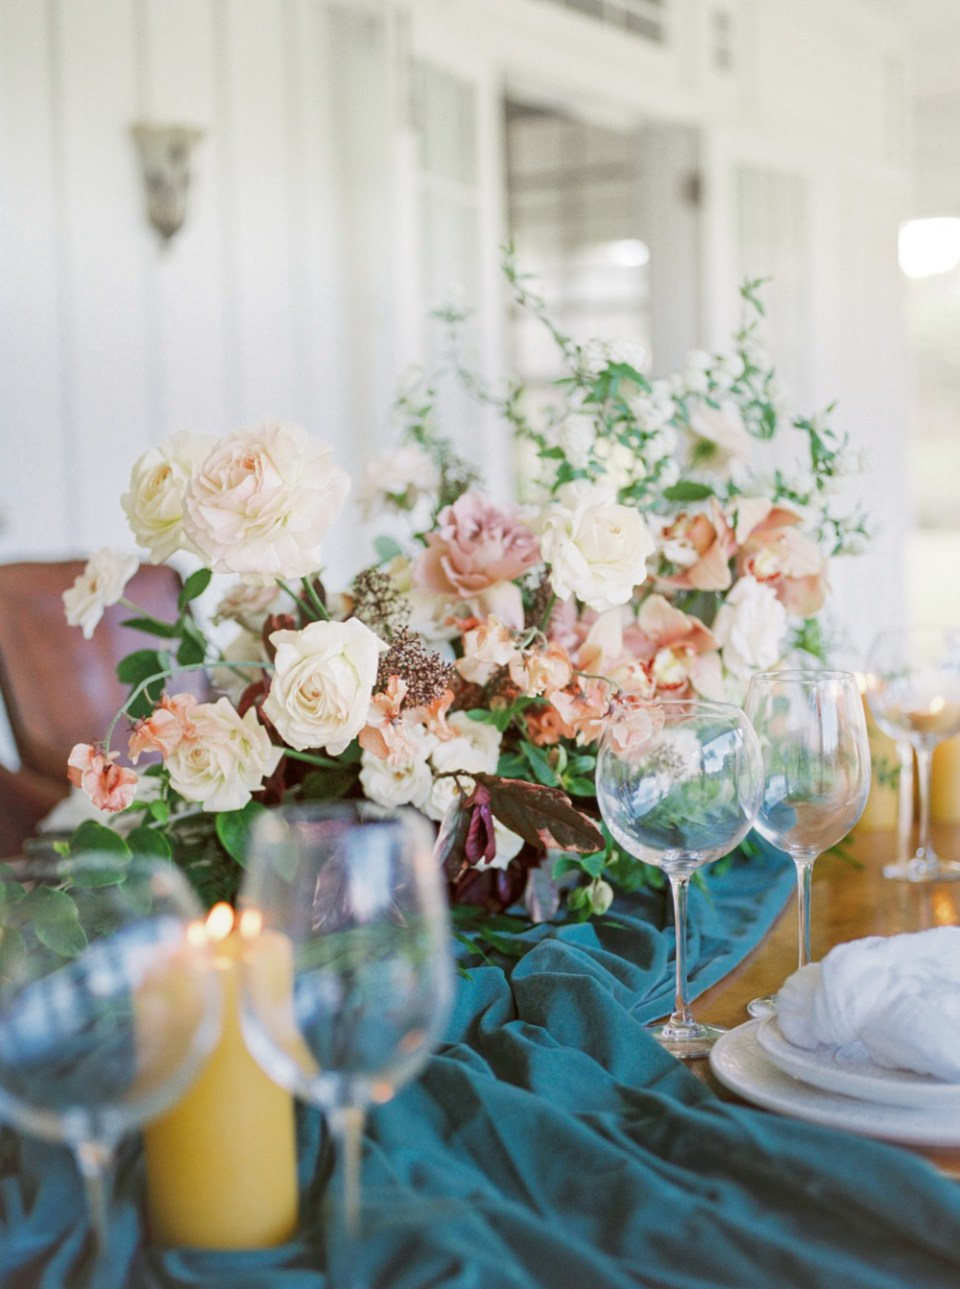 Dillingham Ranch Wedding Decor Inspiration